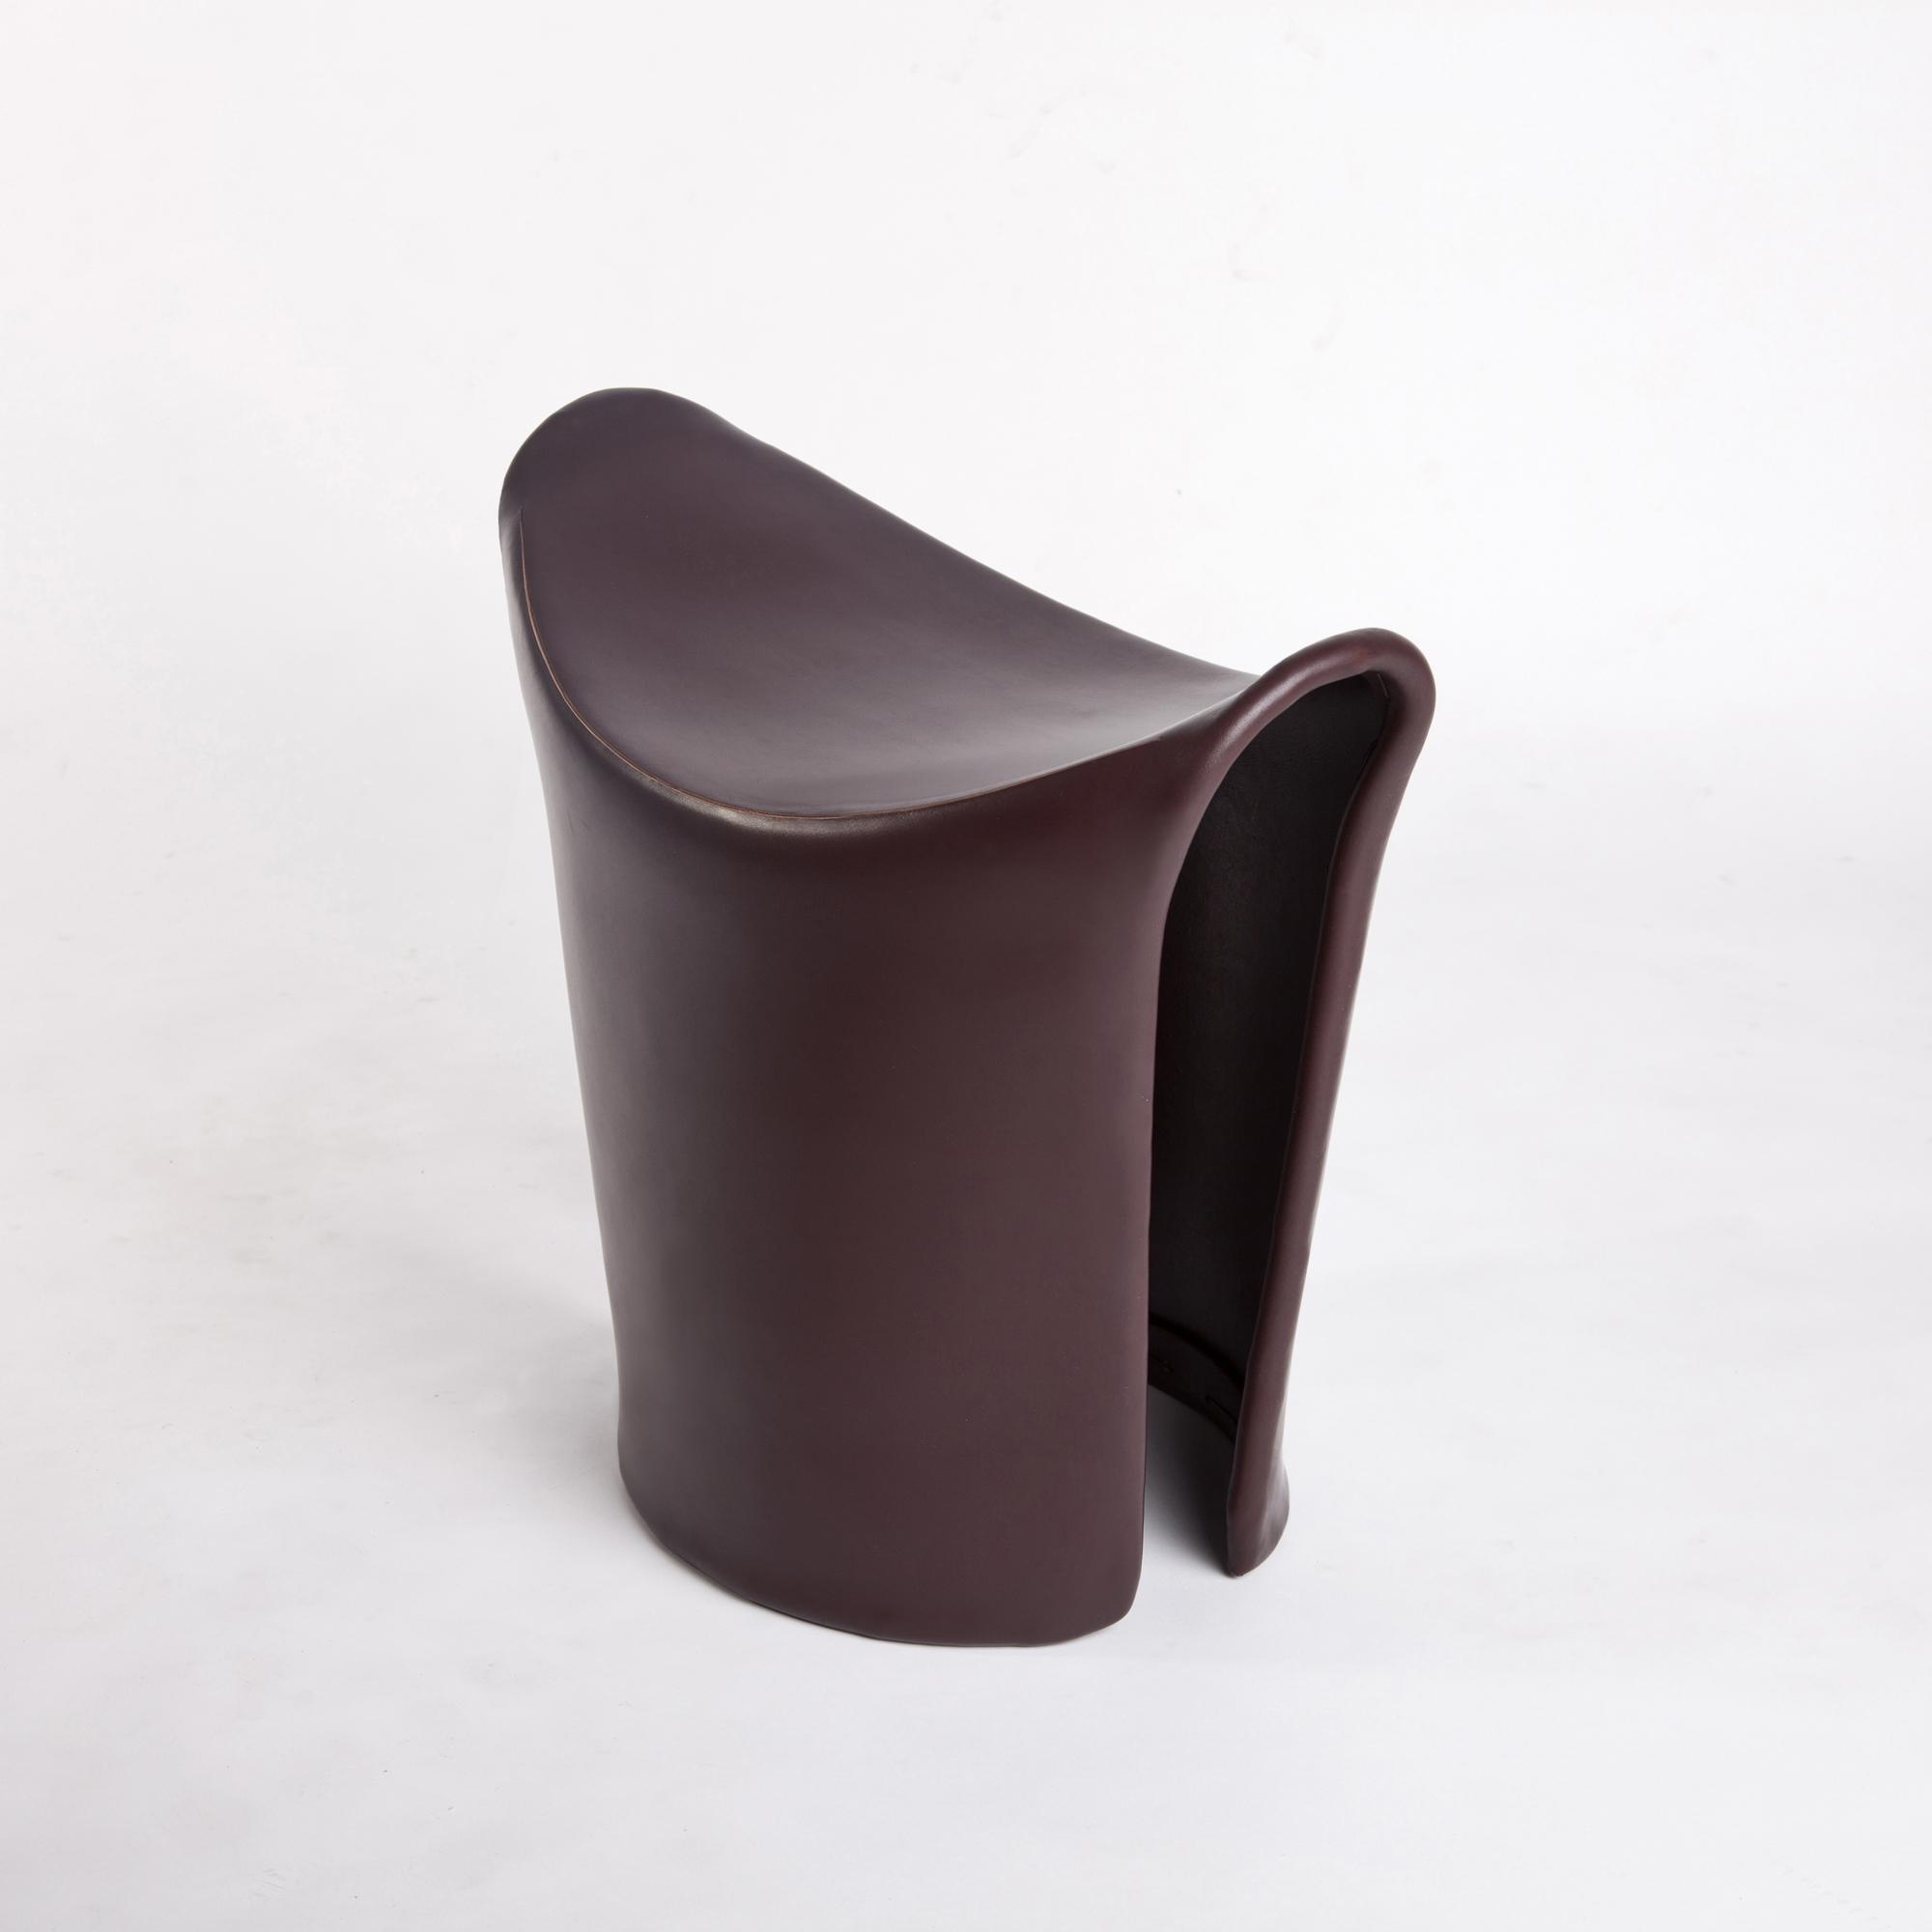 Arc Chairs, Ákos Huber, 2016.